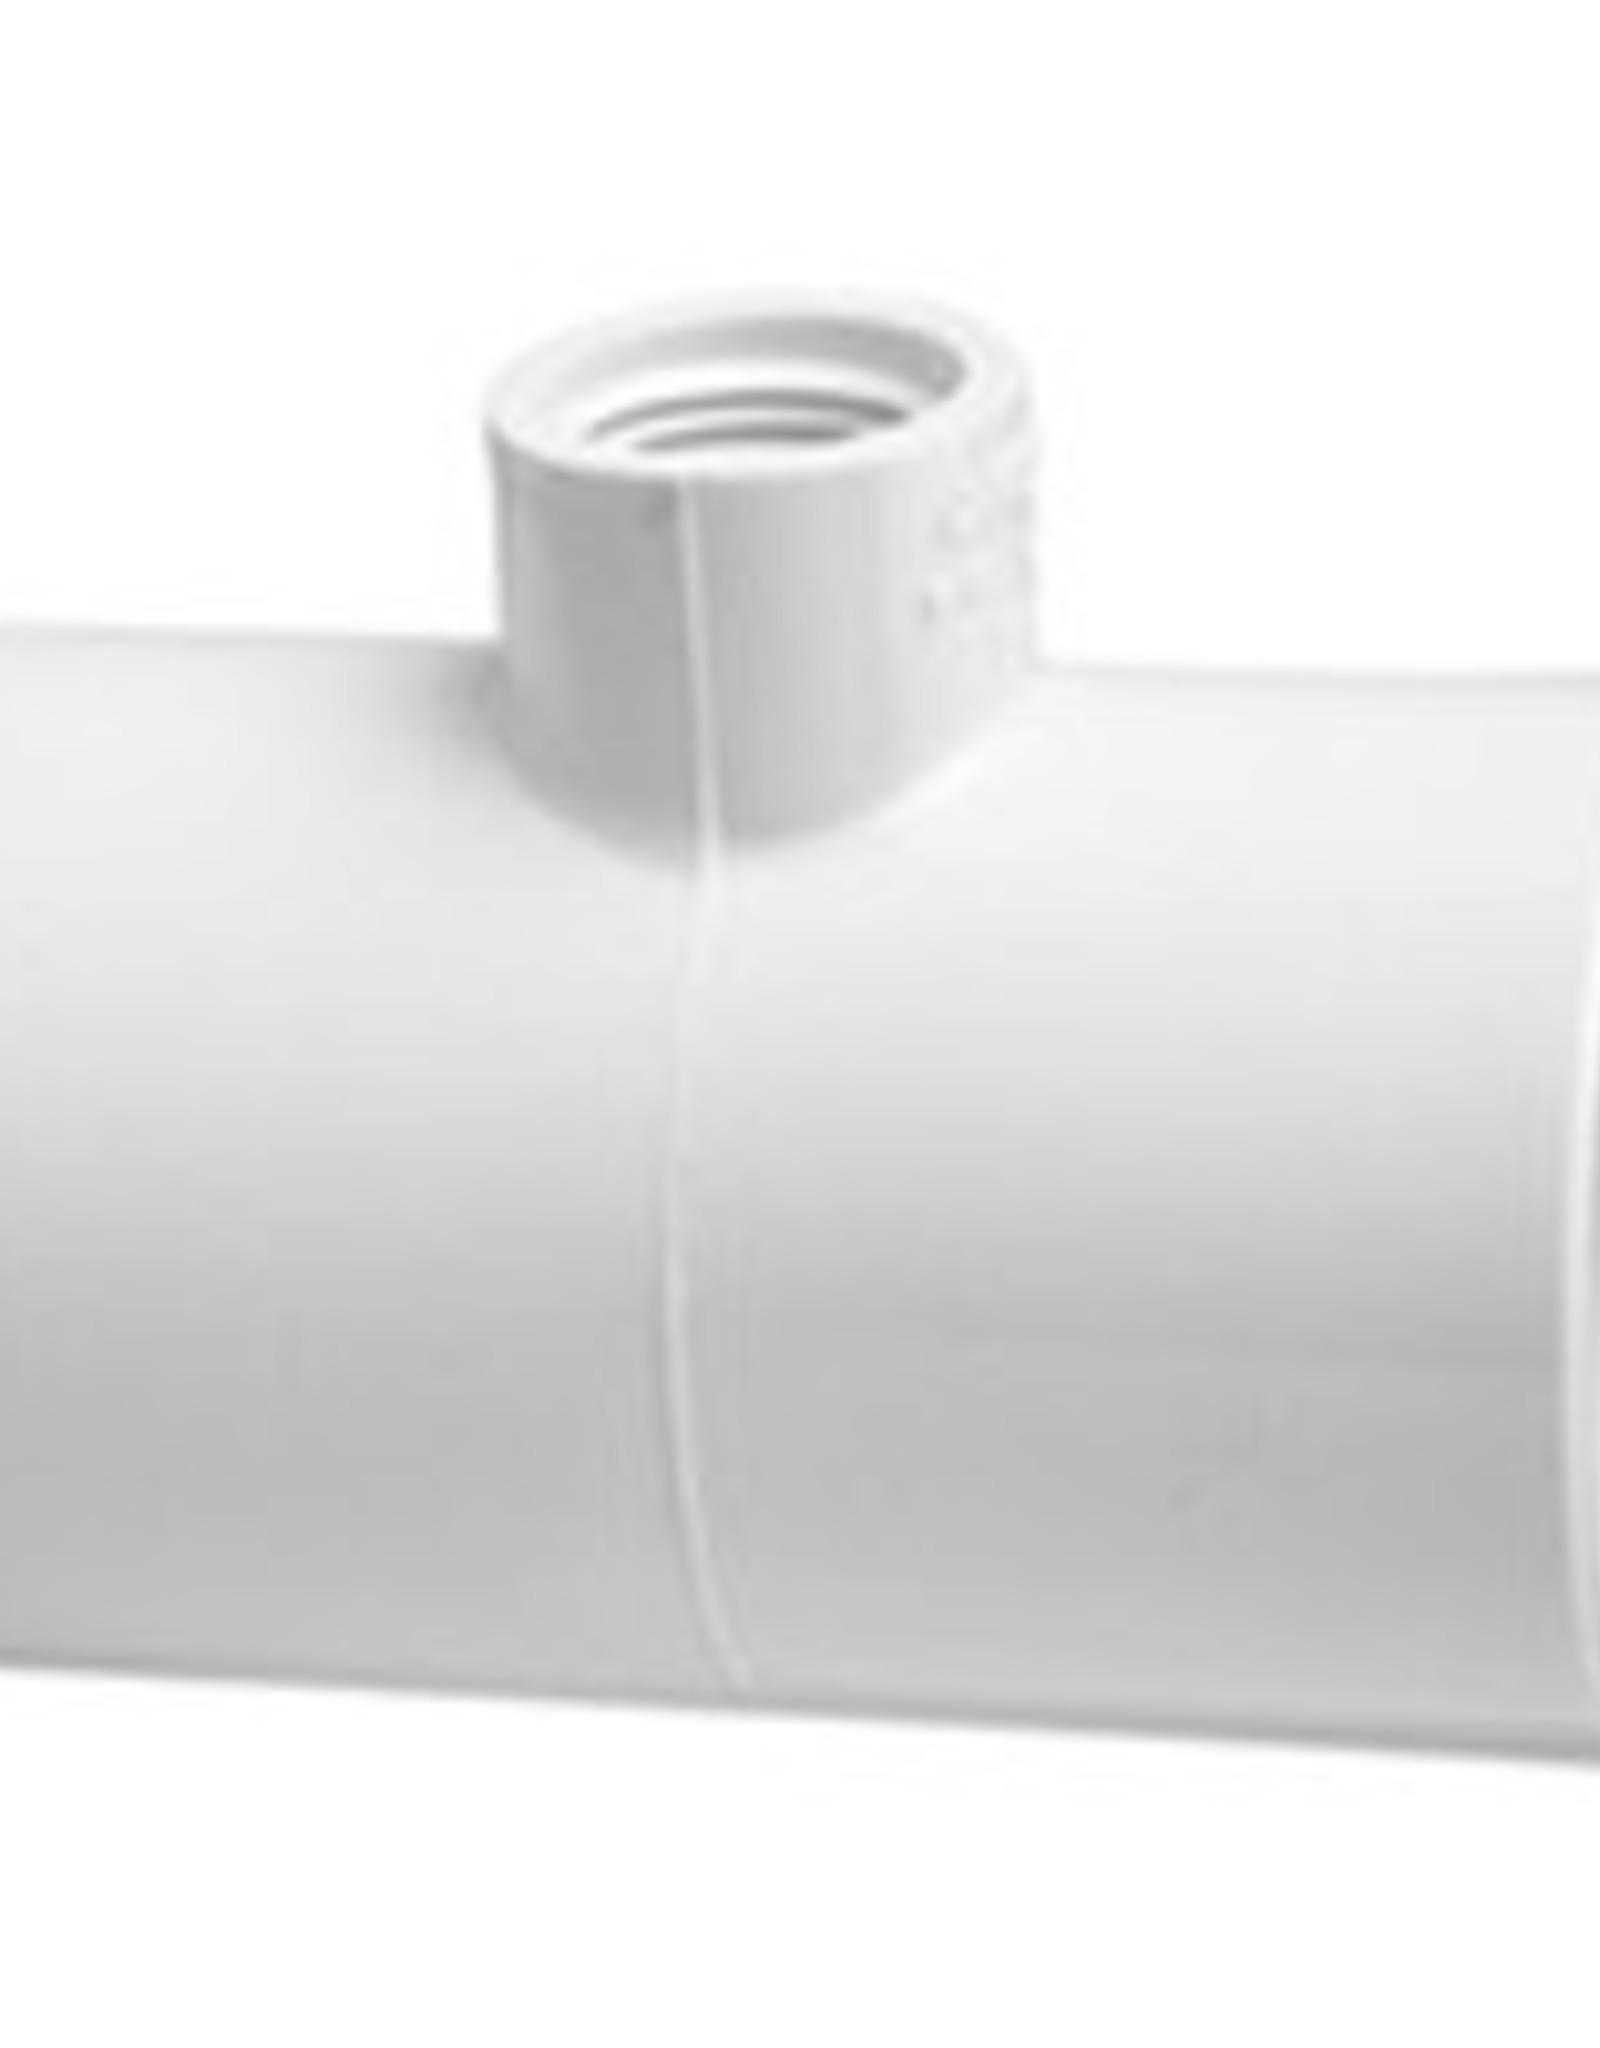 "Lasco Fittings PVC 1"" Reducing Tee Slip x Slip x 1/2"" FPT - 50 PACK"